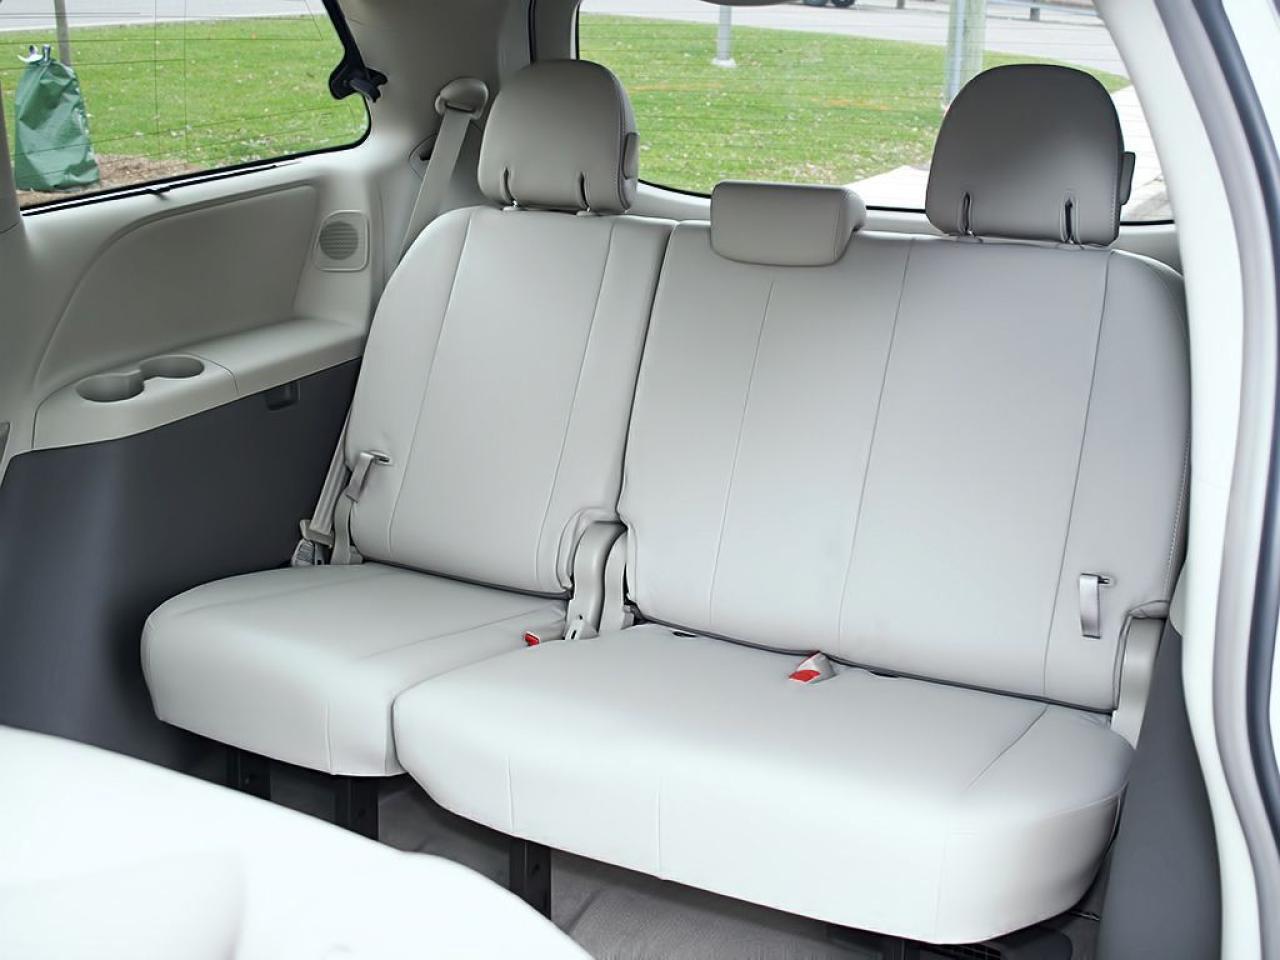 2012 Toyota Sienna XLE AWD LTD NAVI REARCAM DUAL DVD PANOROOF